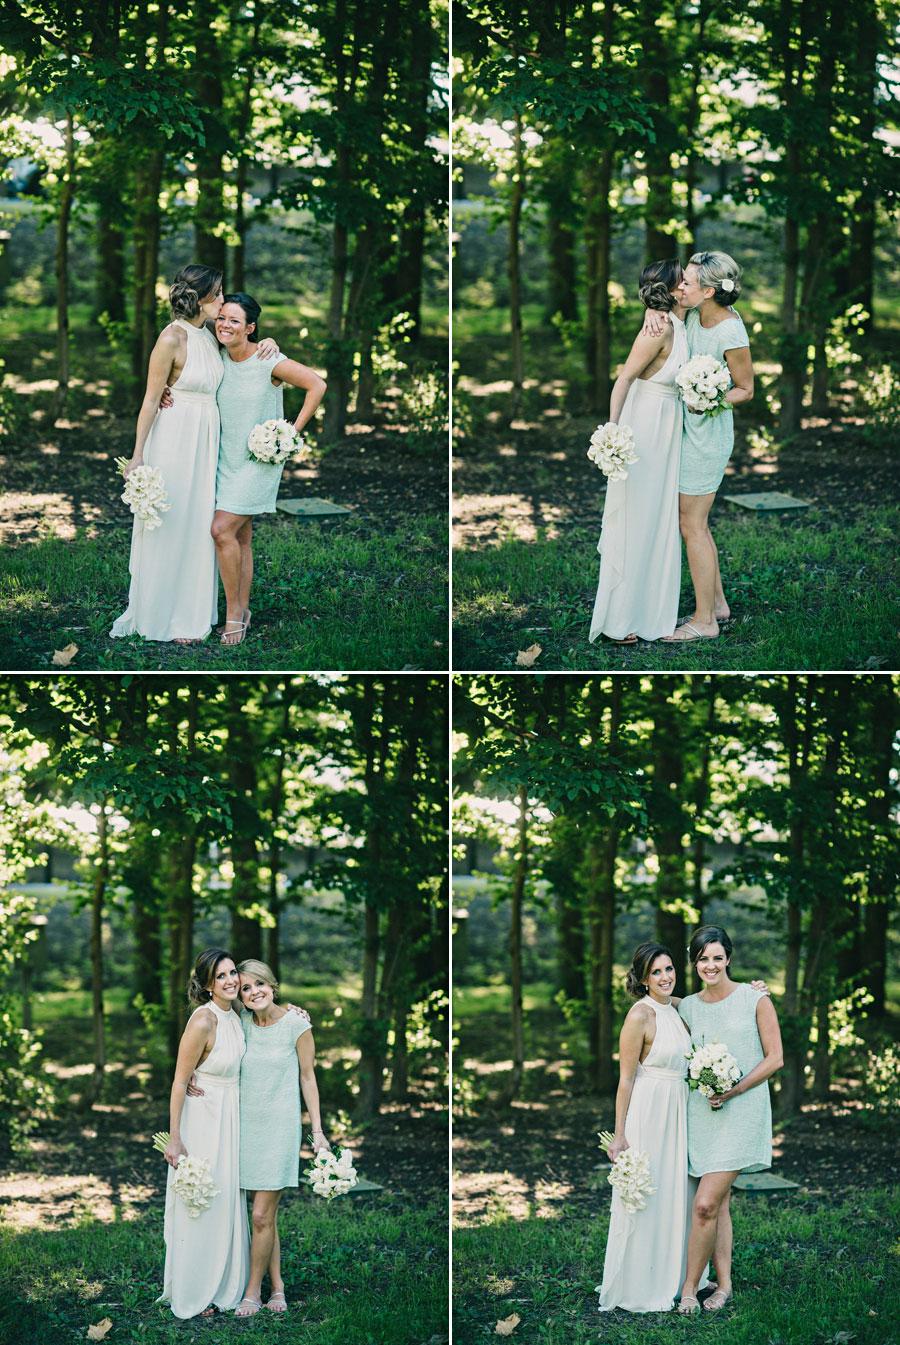 wedding-photography-sorrento-bonnie-mark-077.jpg